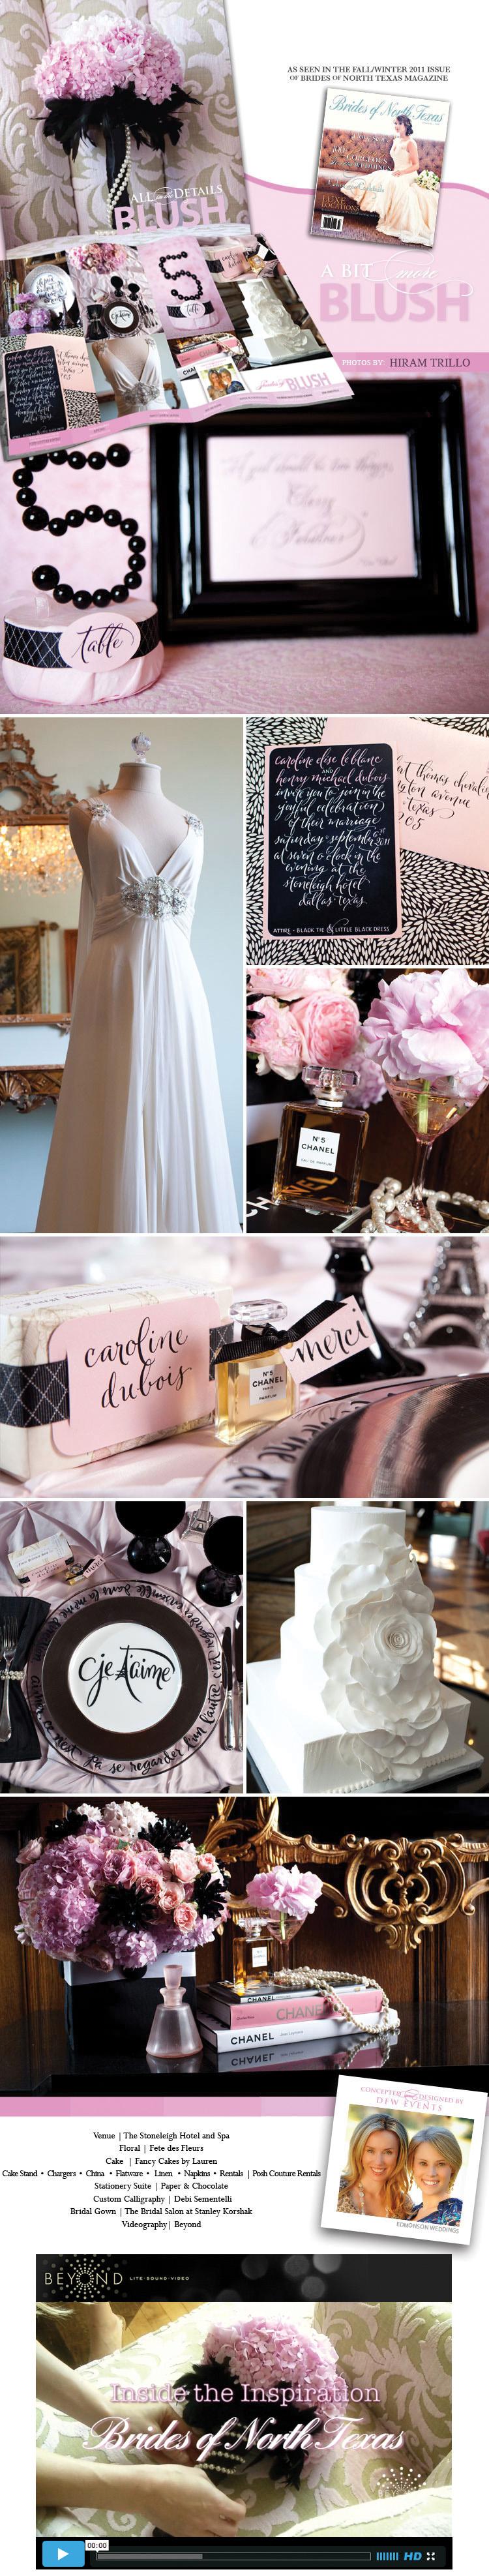 Dallas Fort Worth wedding planner DFW Events